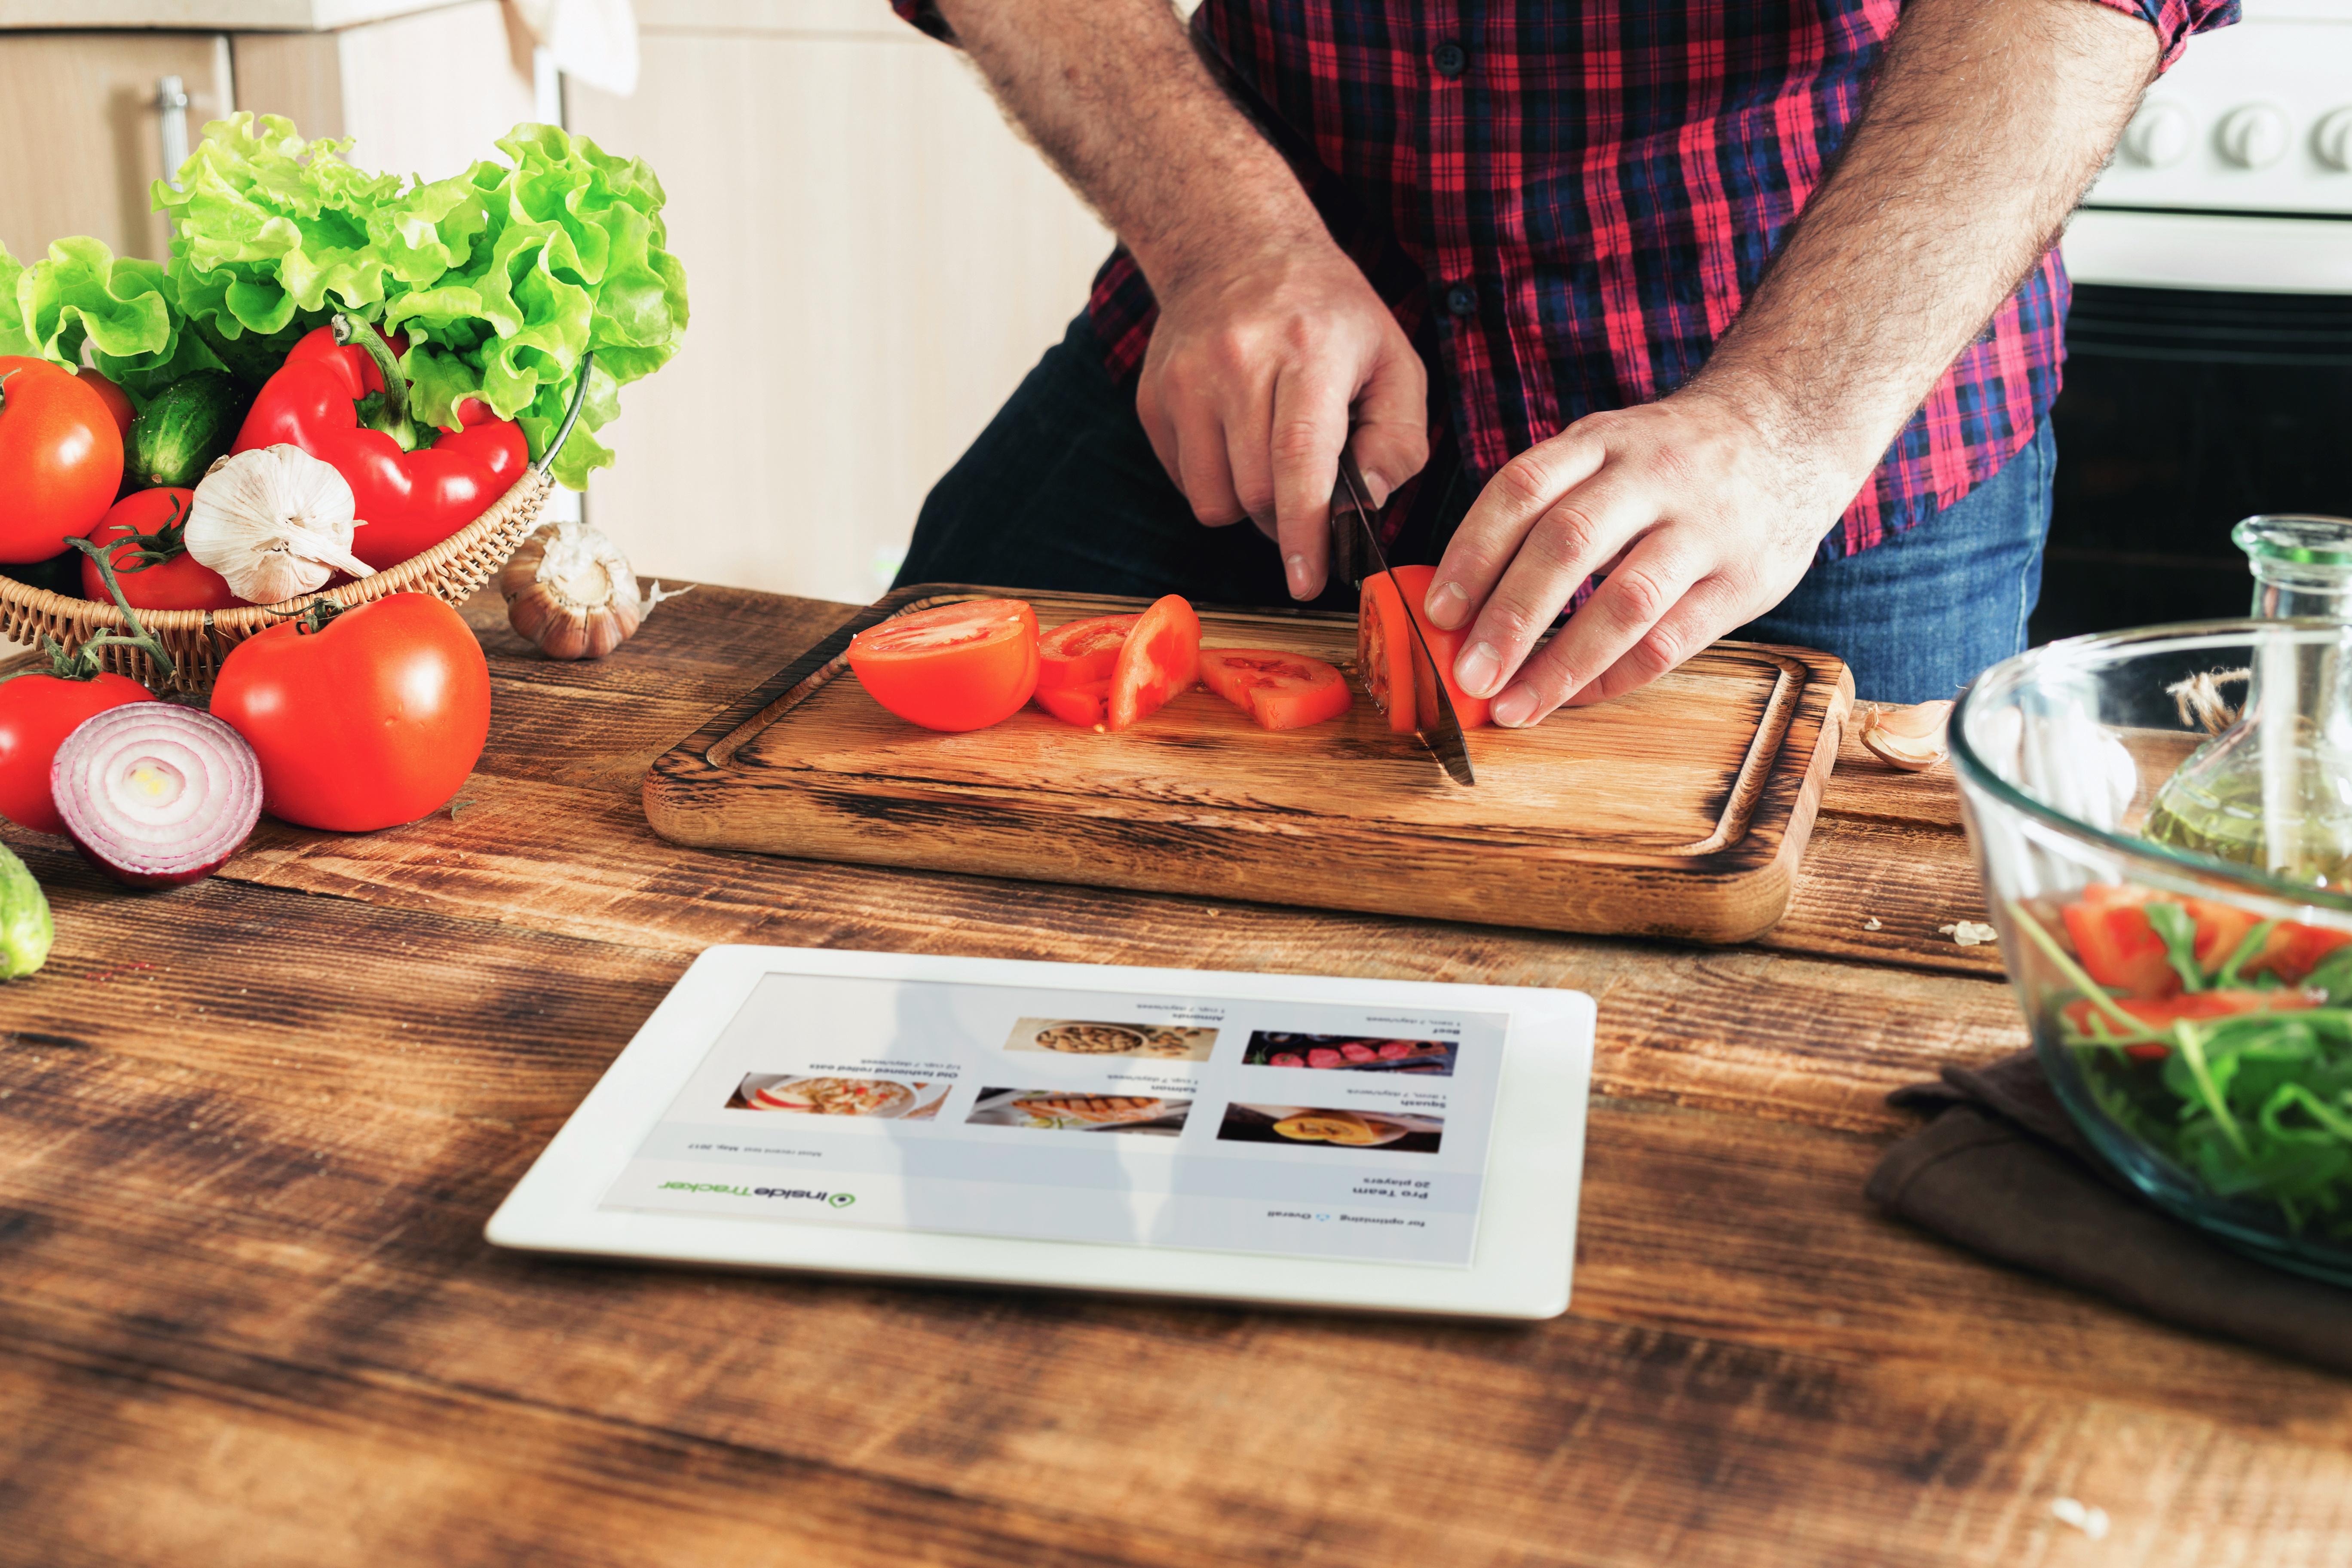 man_cooking_ipad_salad_vegetables.jpg